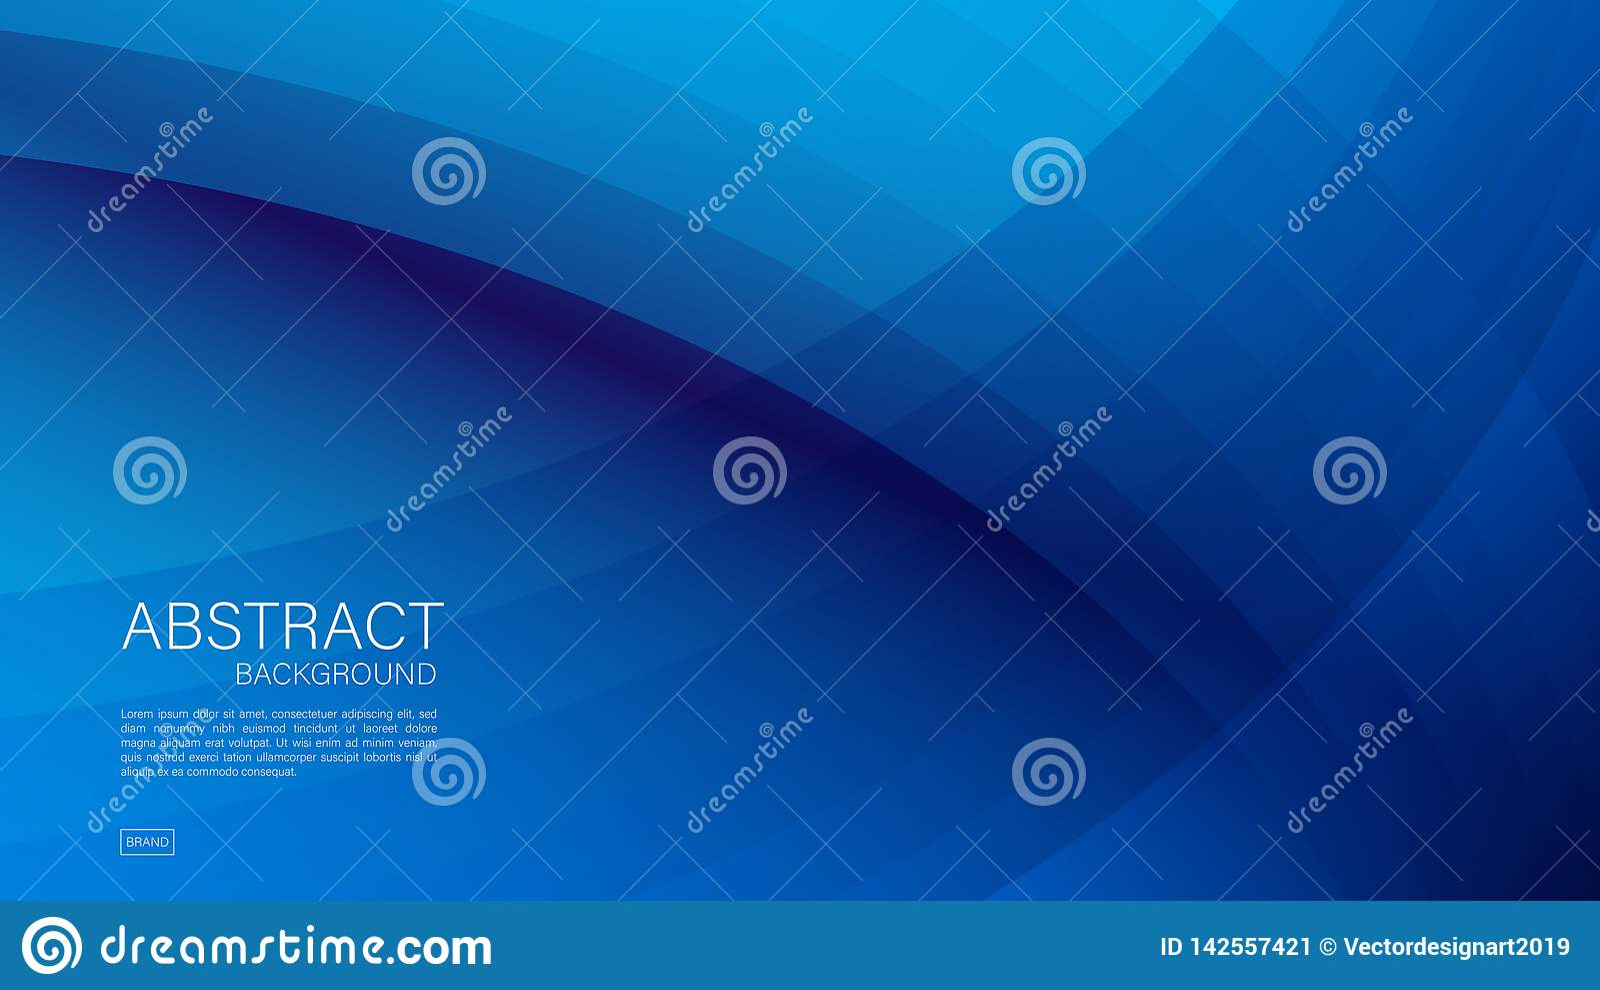 Fundo abstrato azul, onda, vetor geométrico, textura gráfica, mínima, projeto da tampa, molde do inseto, bandeira, página da